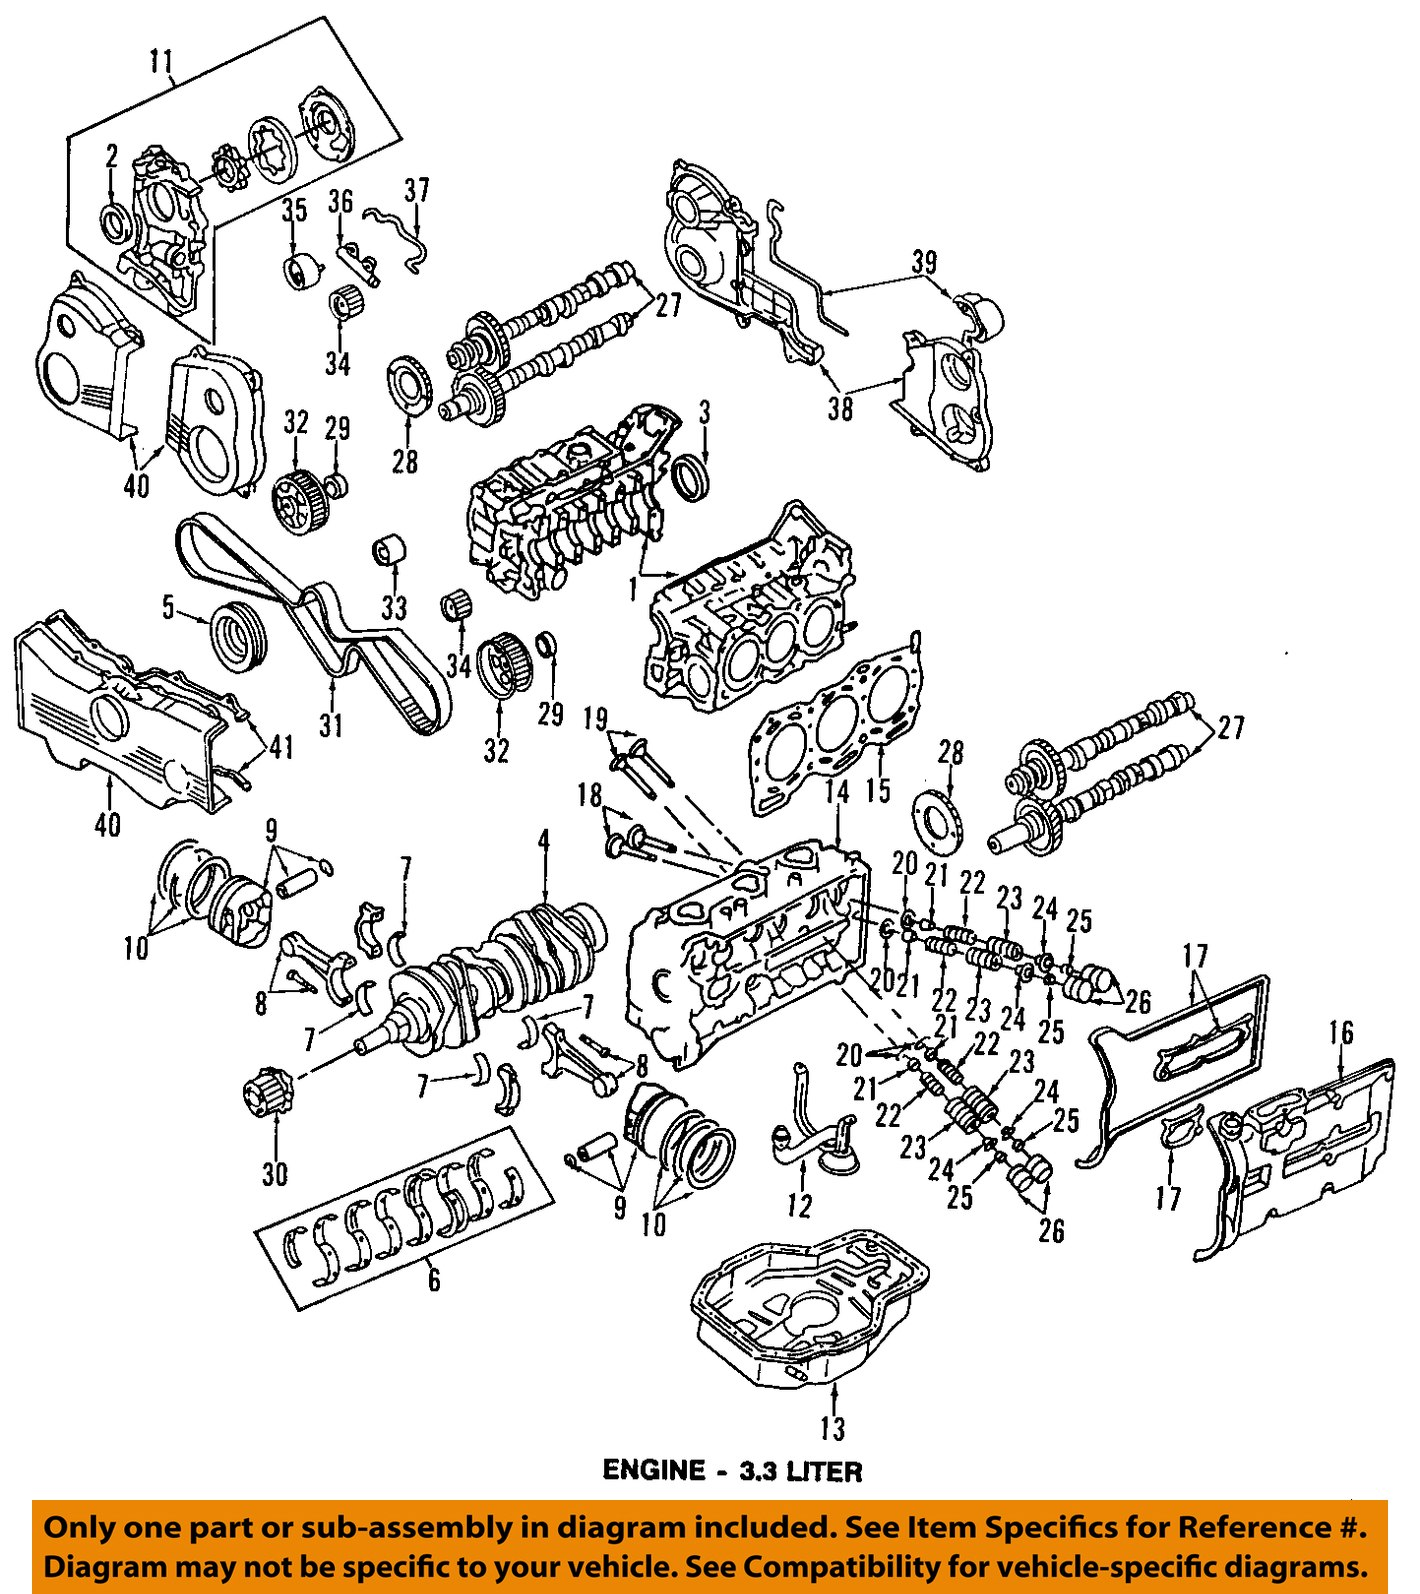 92 Subaru Legacy Engine Diagram Wiring Diagrams 2002 Oem 97 Svx Timing Belt 13028aa120 Outback Parts 2006